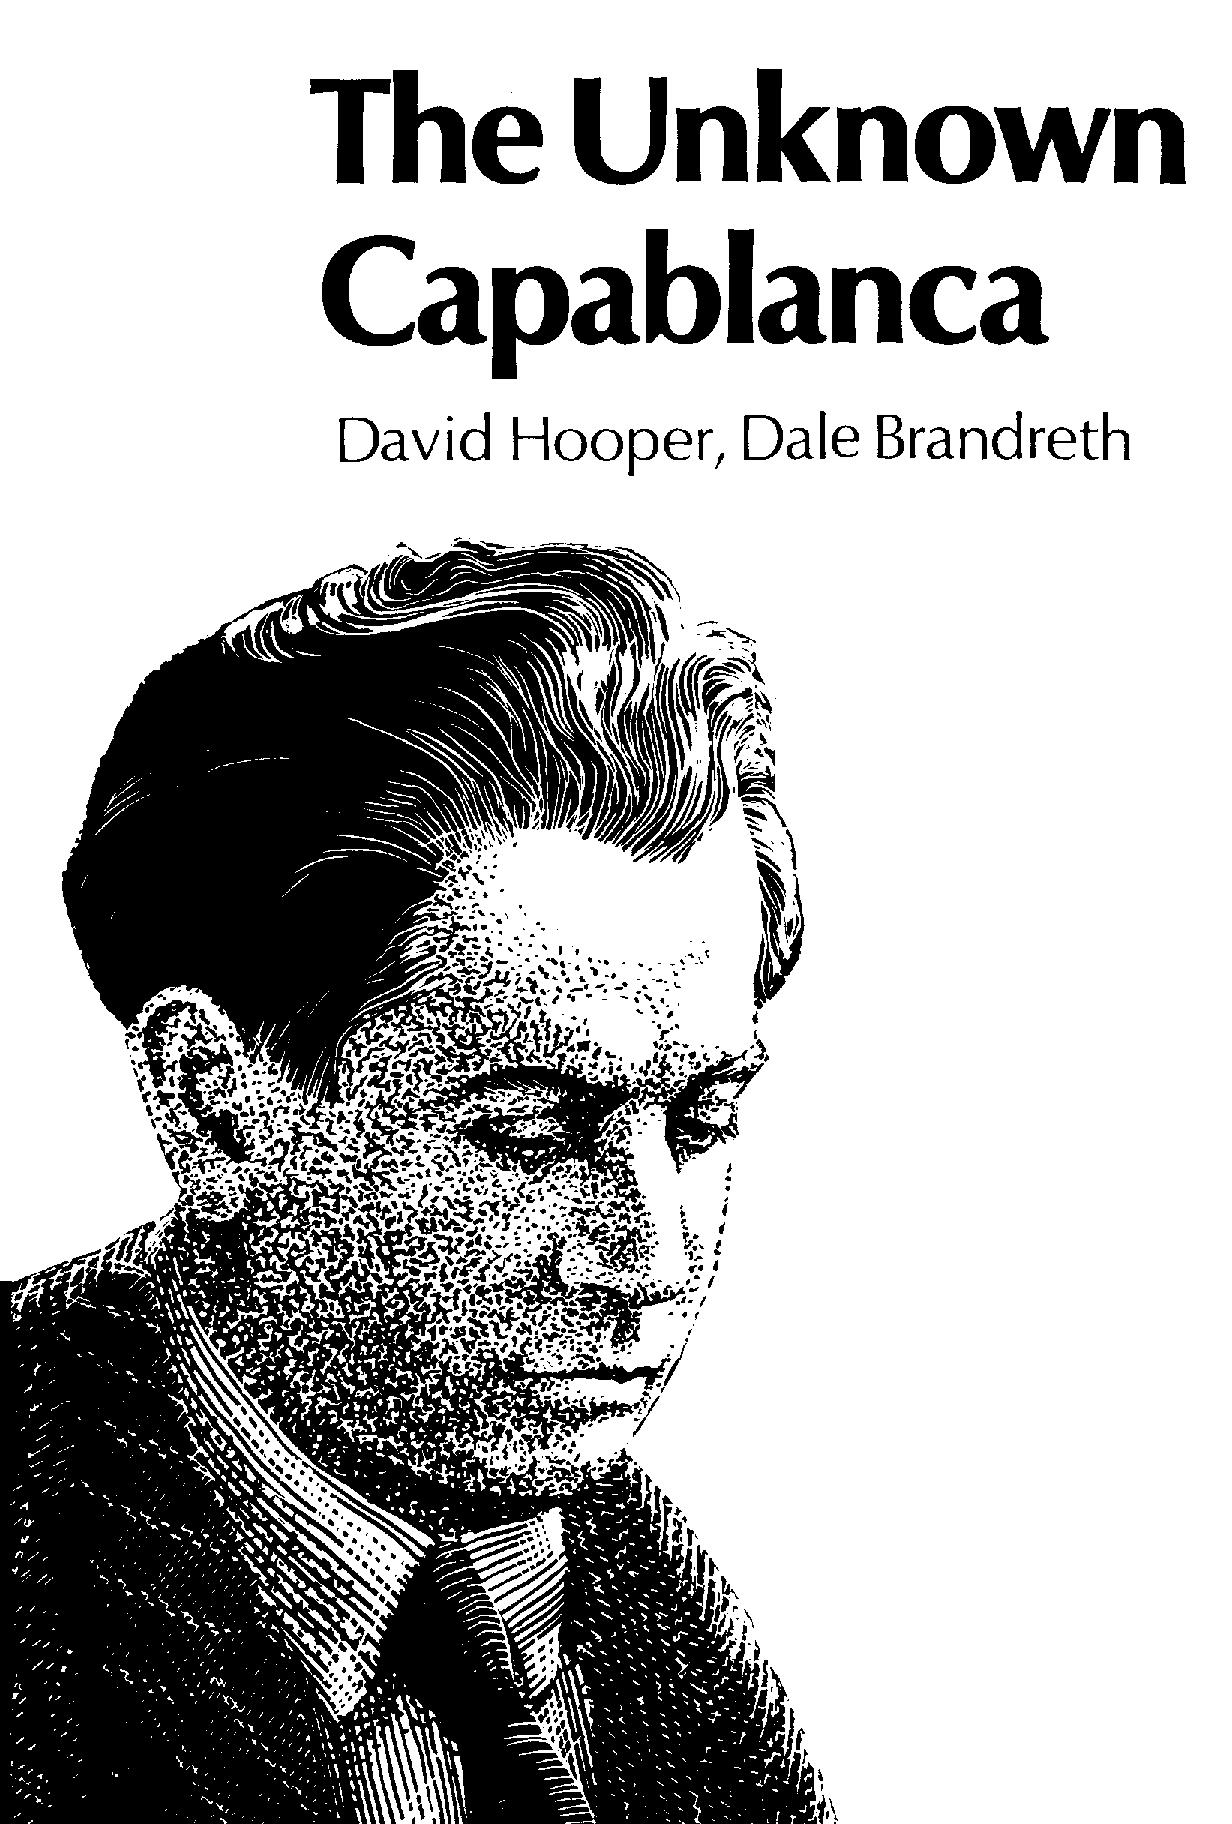 Hooper, David & Brandreth, Dale - The Unknown Capablanca.pdf